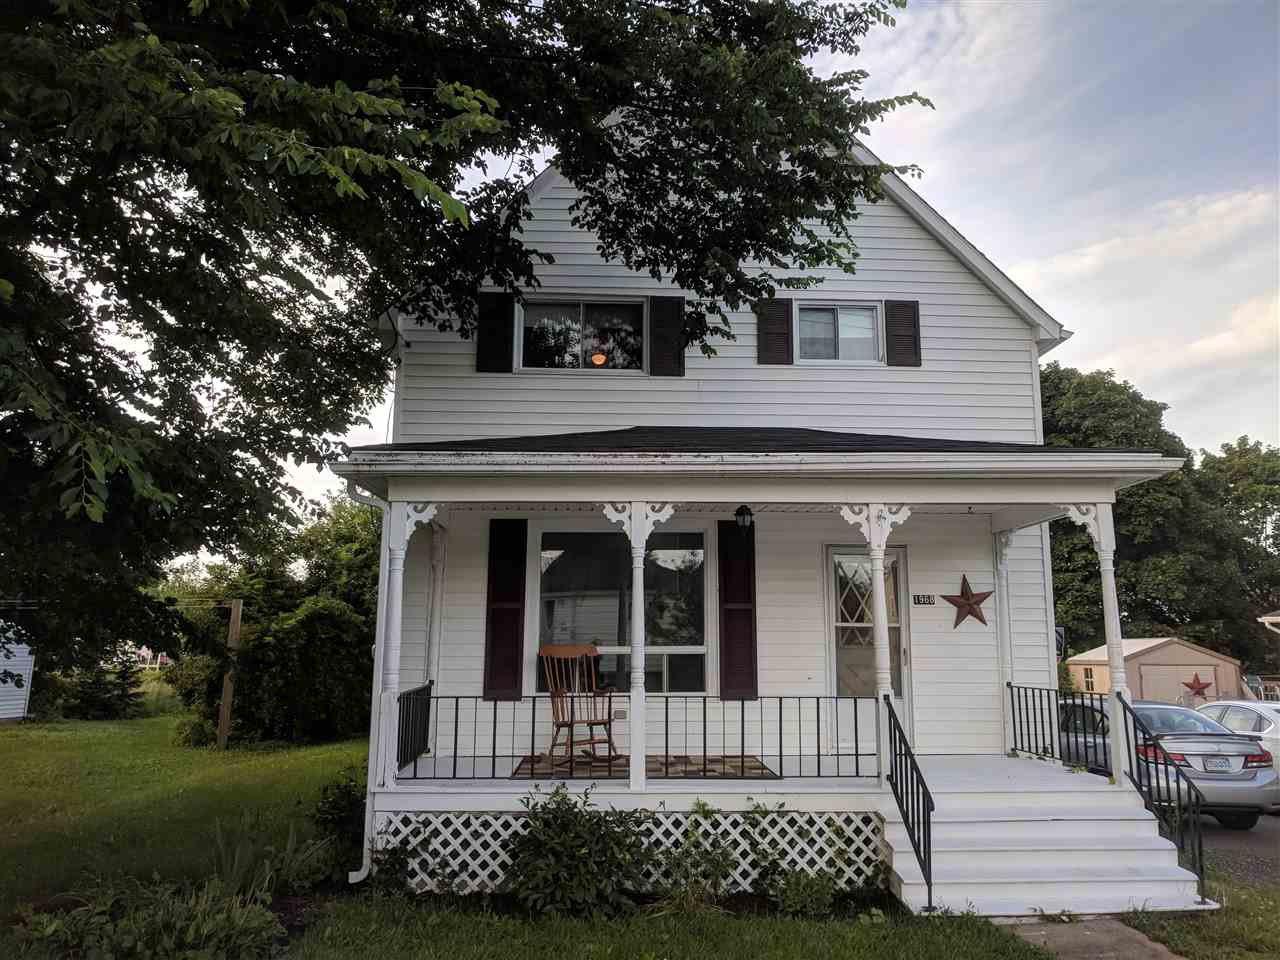 Main Photo: 1968 West Street in Westville: 107-Trenton,Westville,Pictou Residential for sale (Northern Region)  : MLS®# 202007078